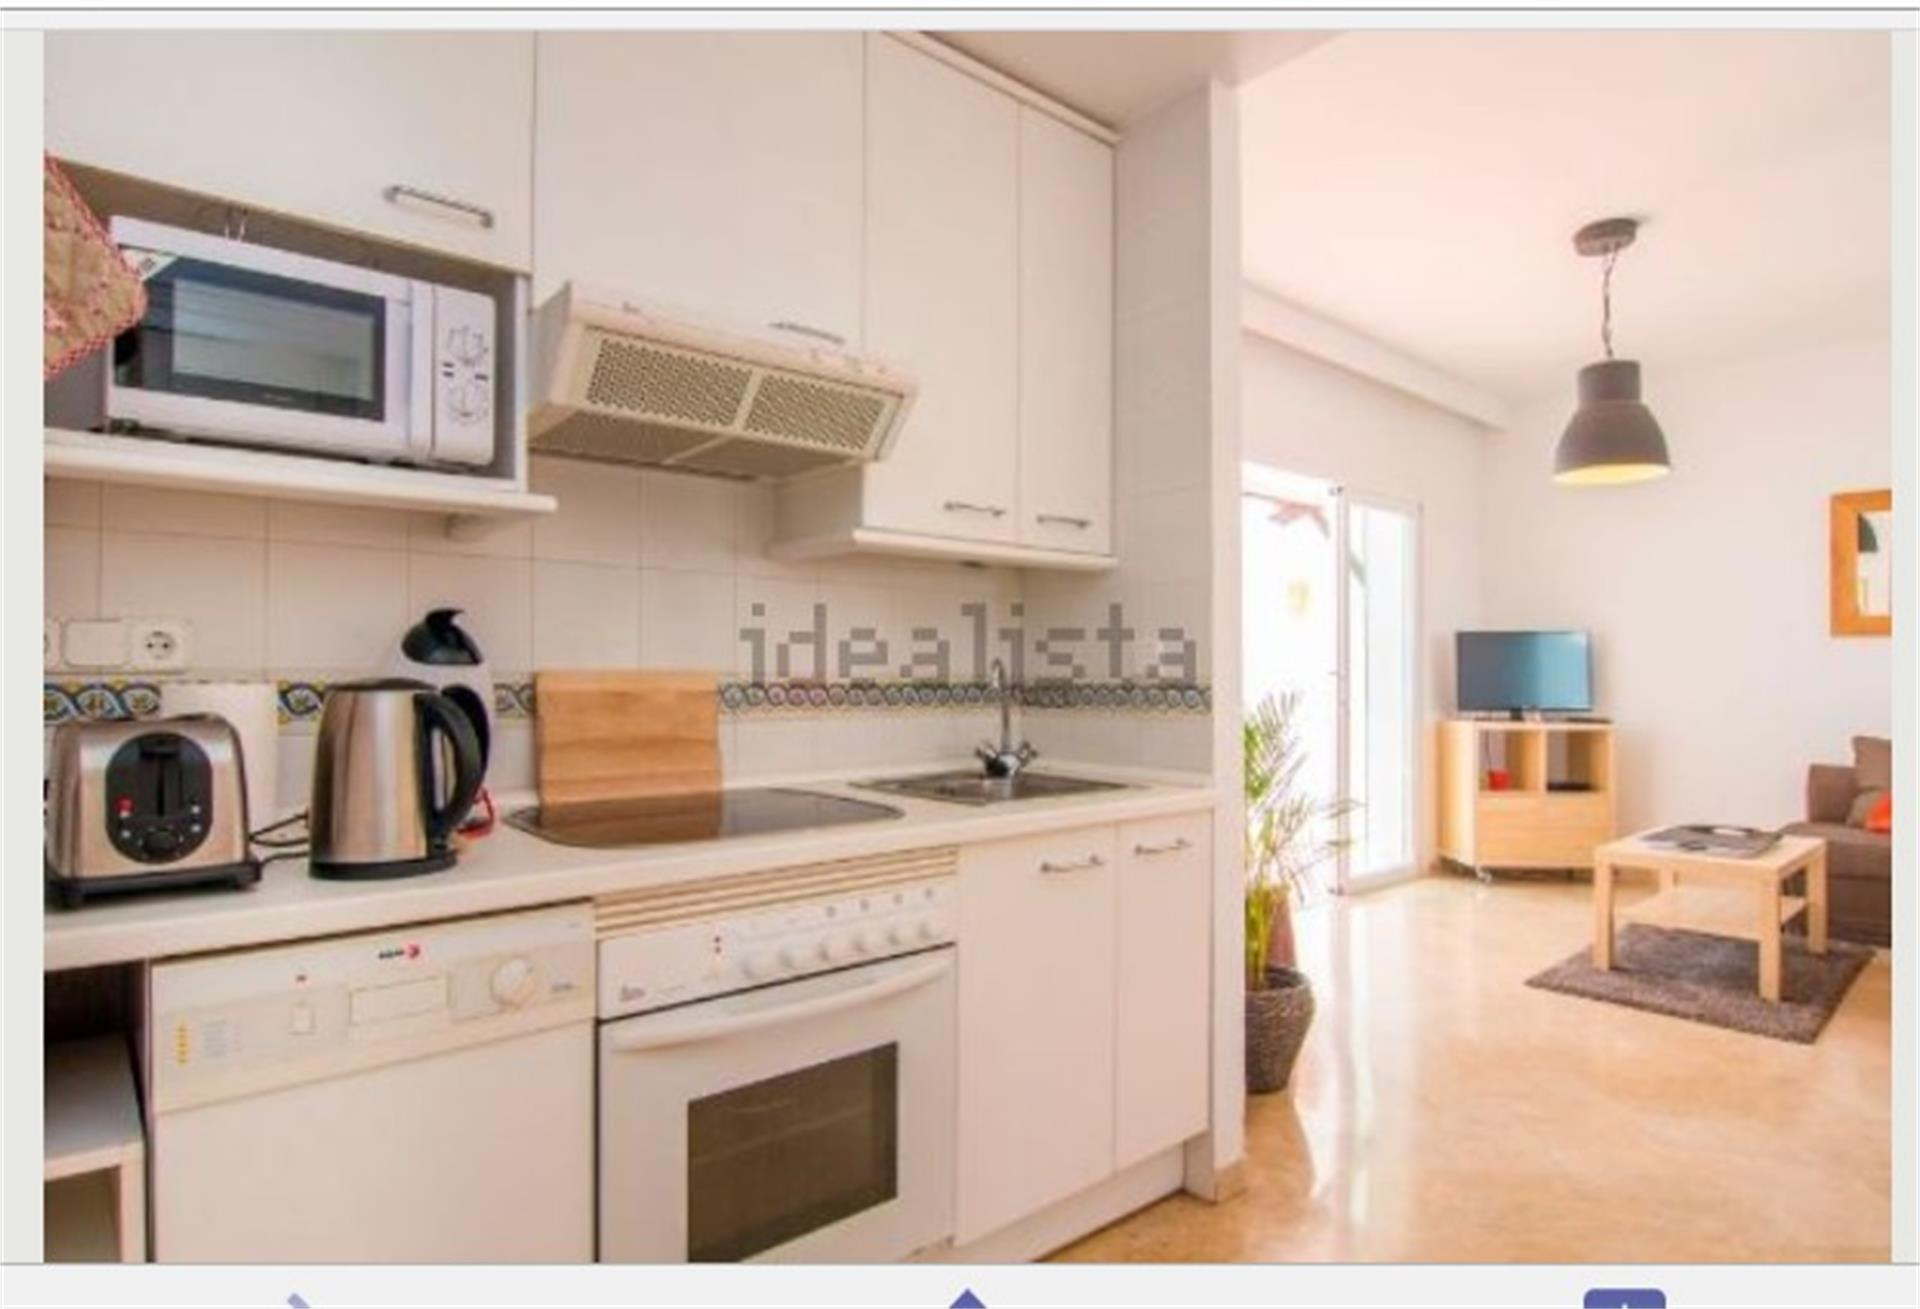 Apartamento de alquiler en Bel Air - Cancelada - Saladillo (Bel-Air, Málaga)